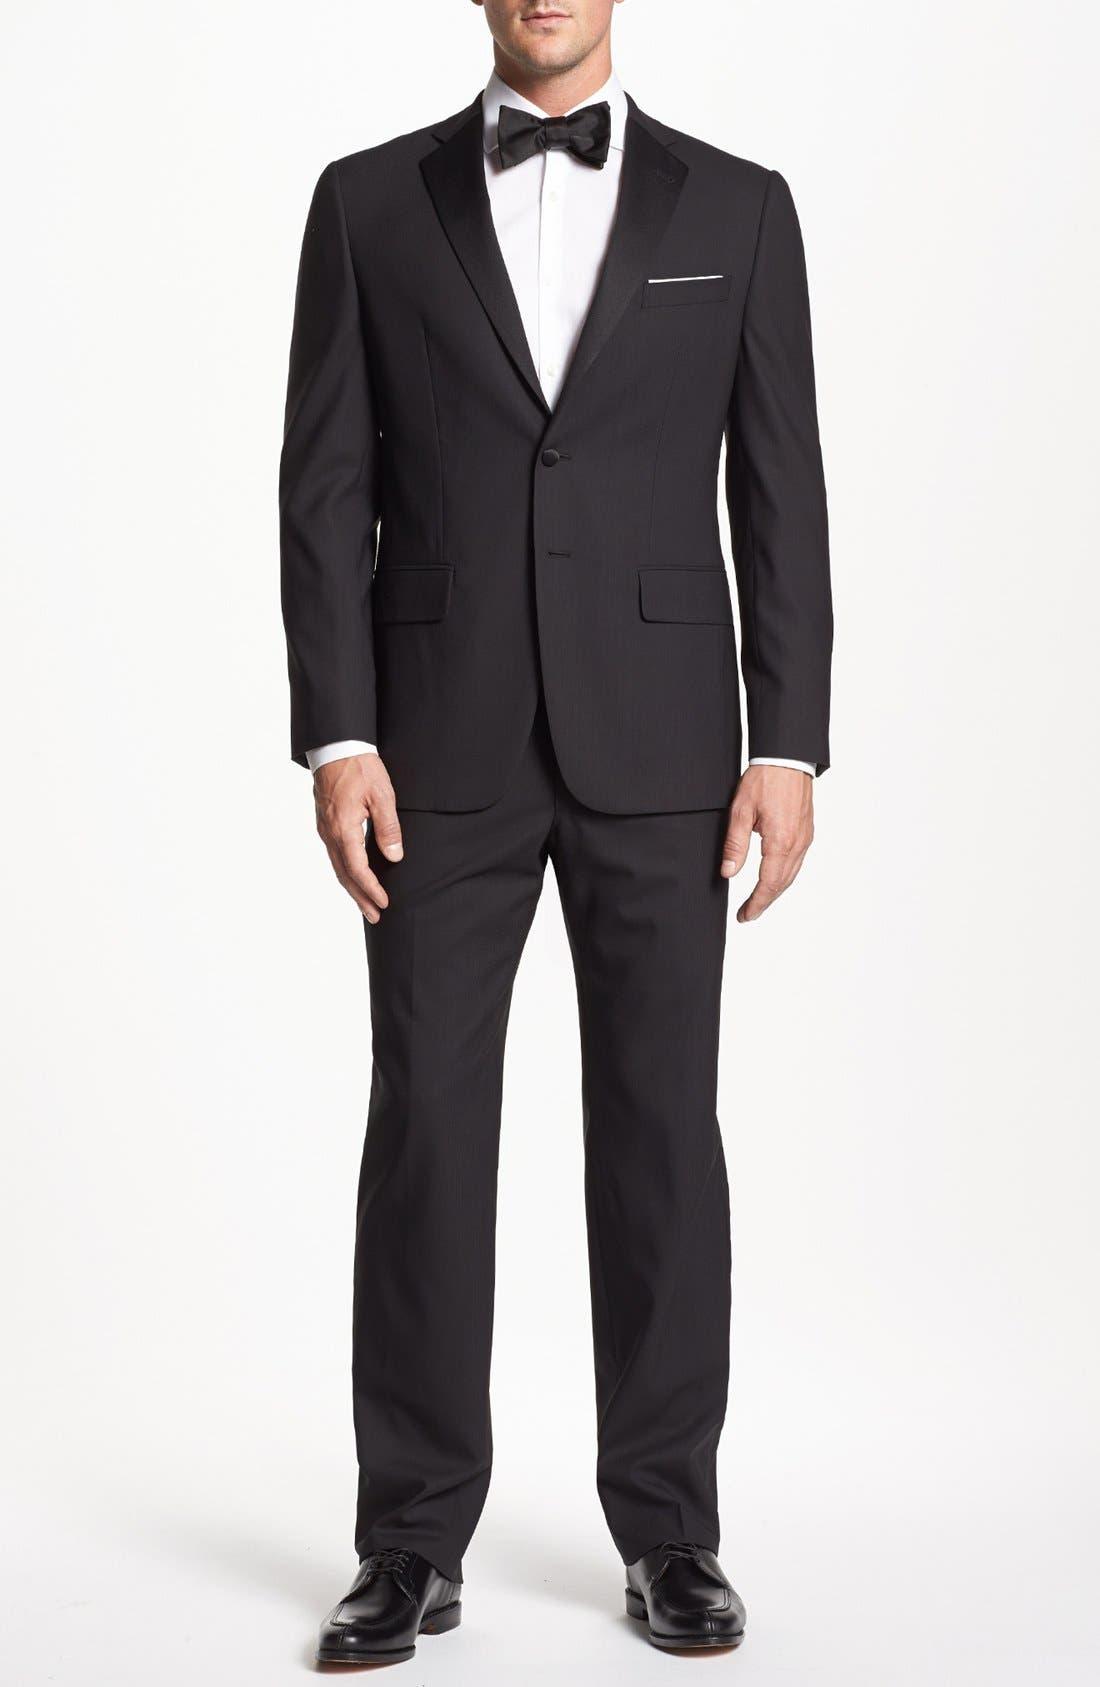 Alternate Image 1 Selected - Joseph Abboud 'Profile Hybrid' Trim Fit Wool Tuxedo (Online Only)